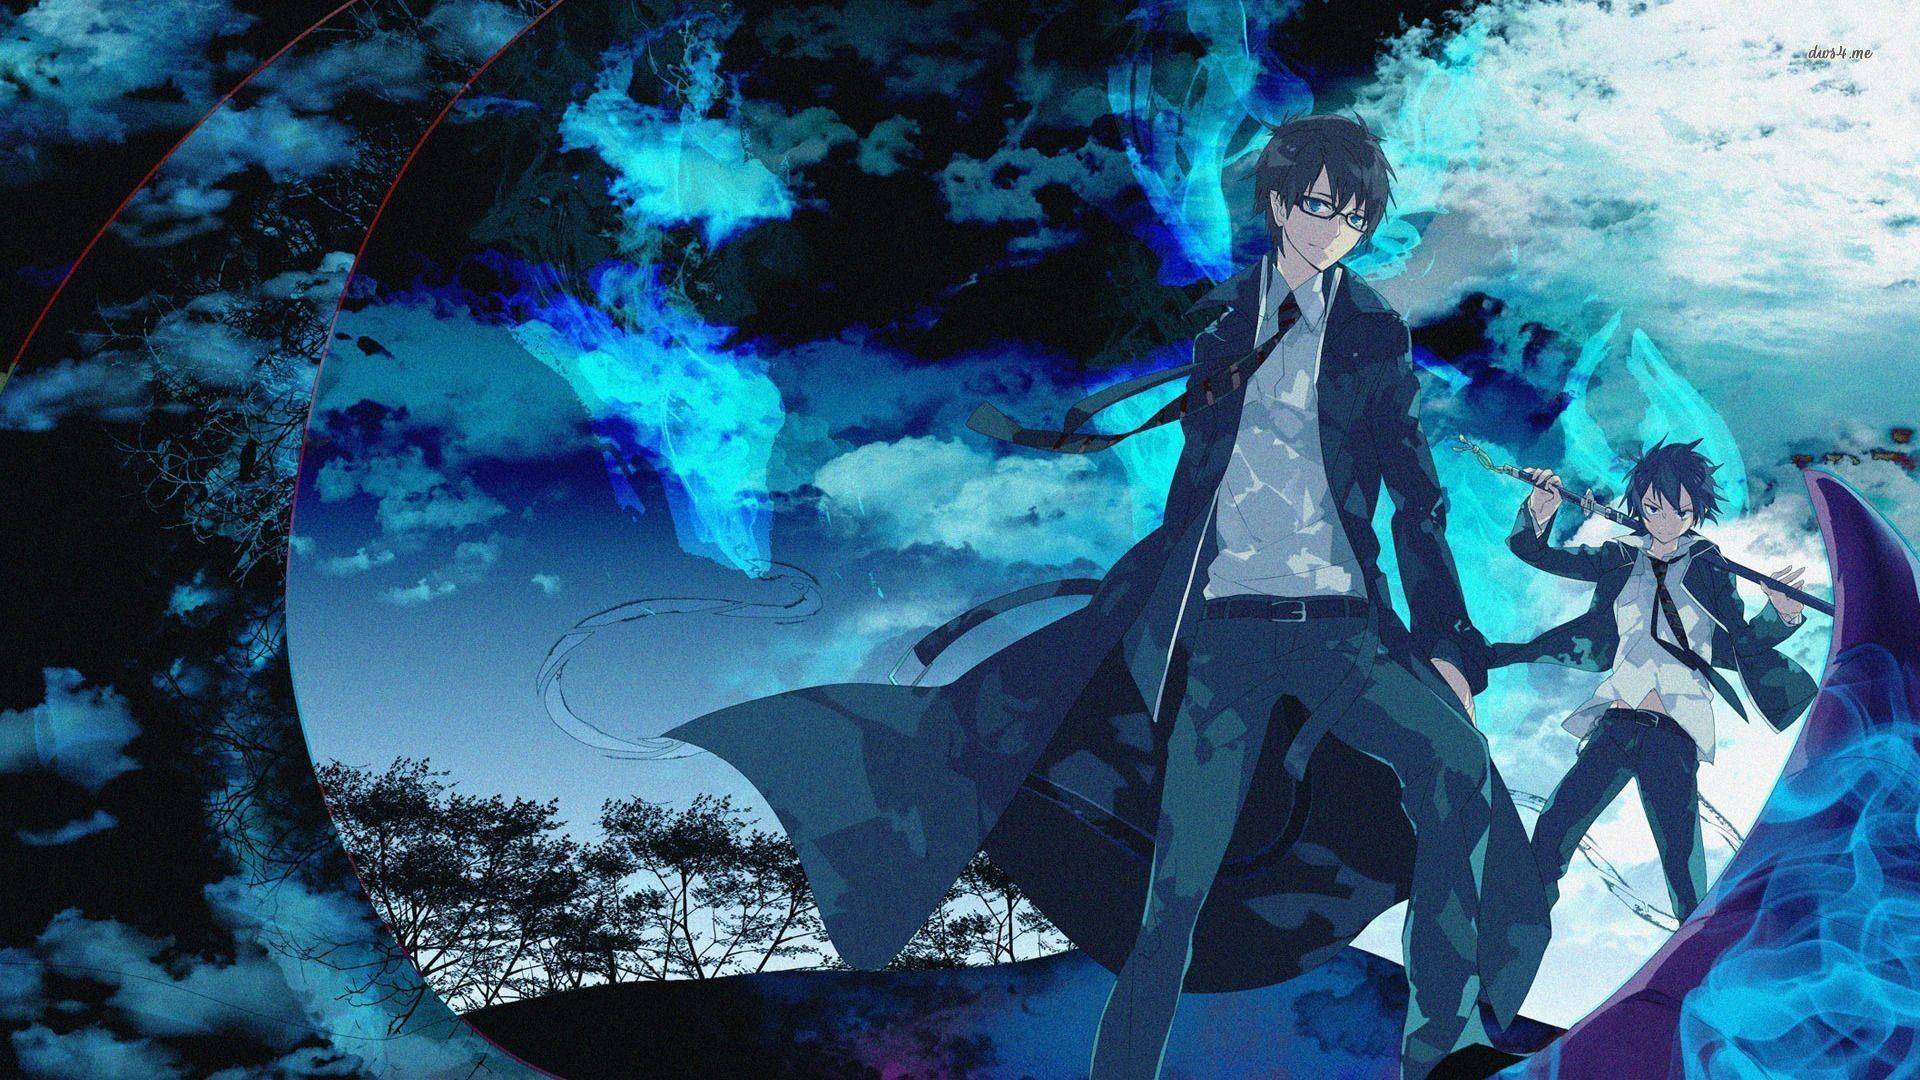 Anime wallpaper 1360 x 768 70 images - 1920x1080 hentai wallpaper ...